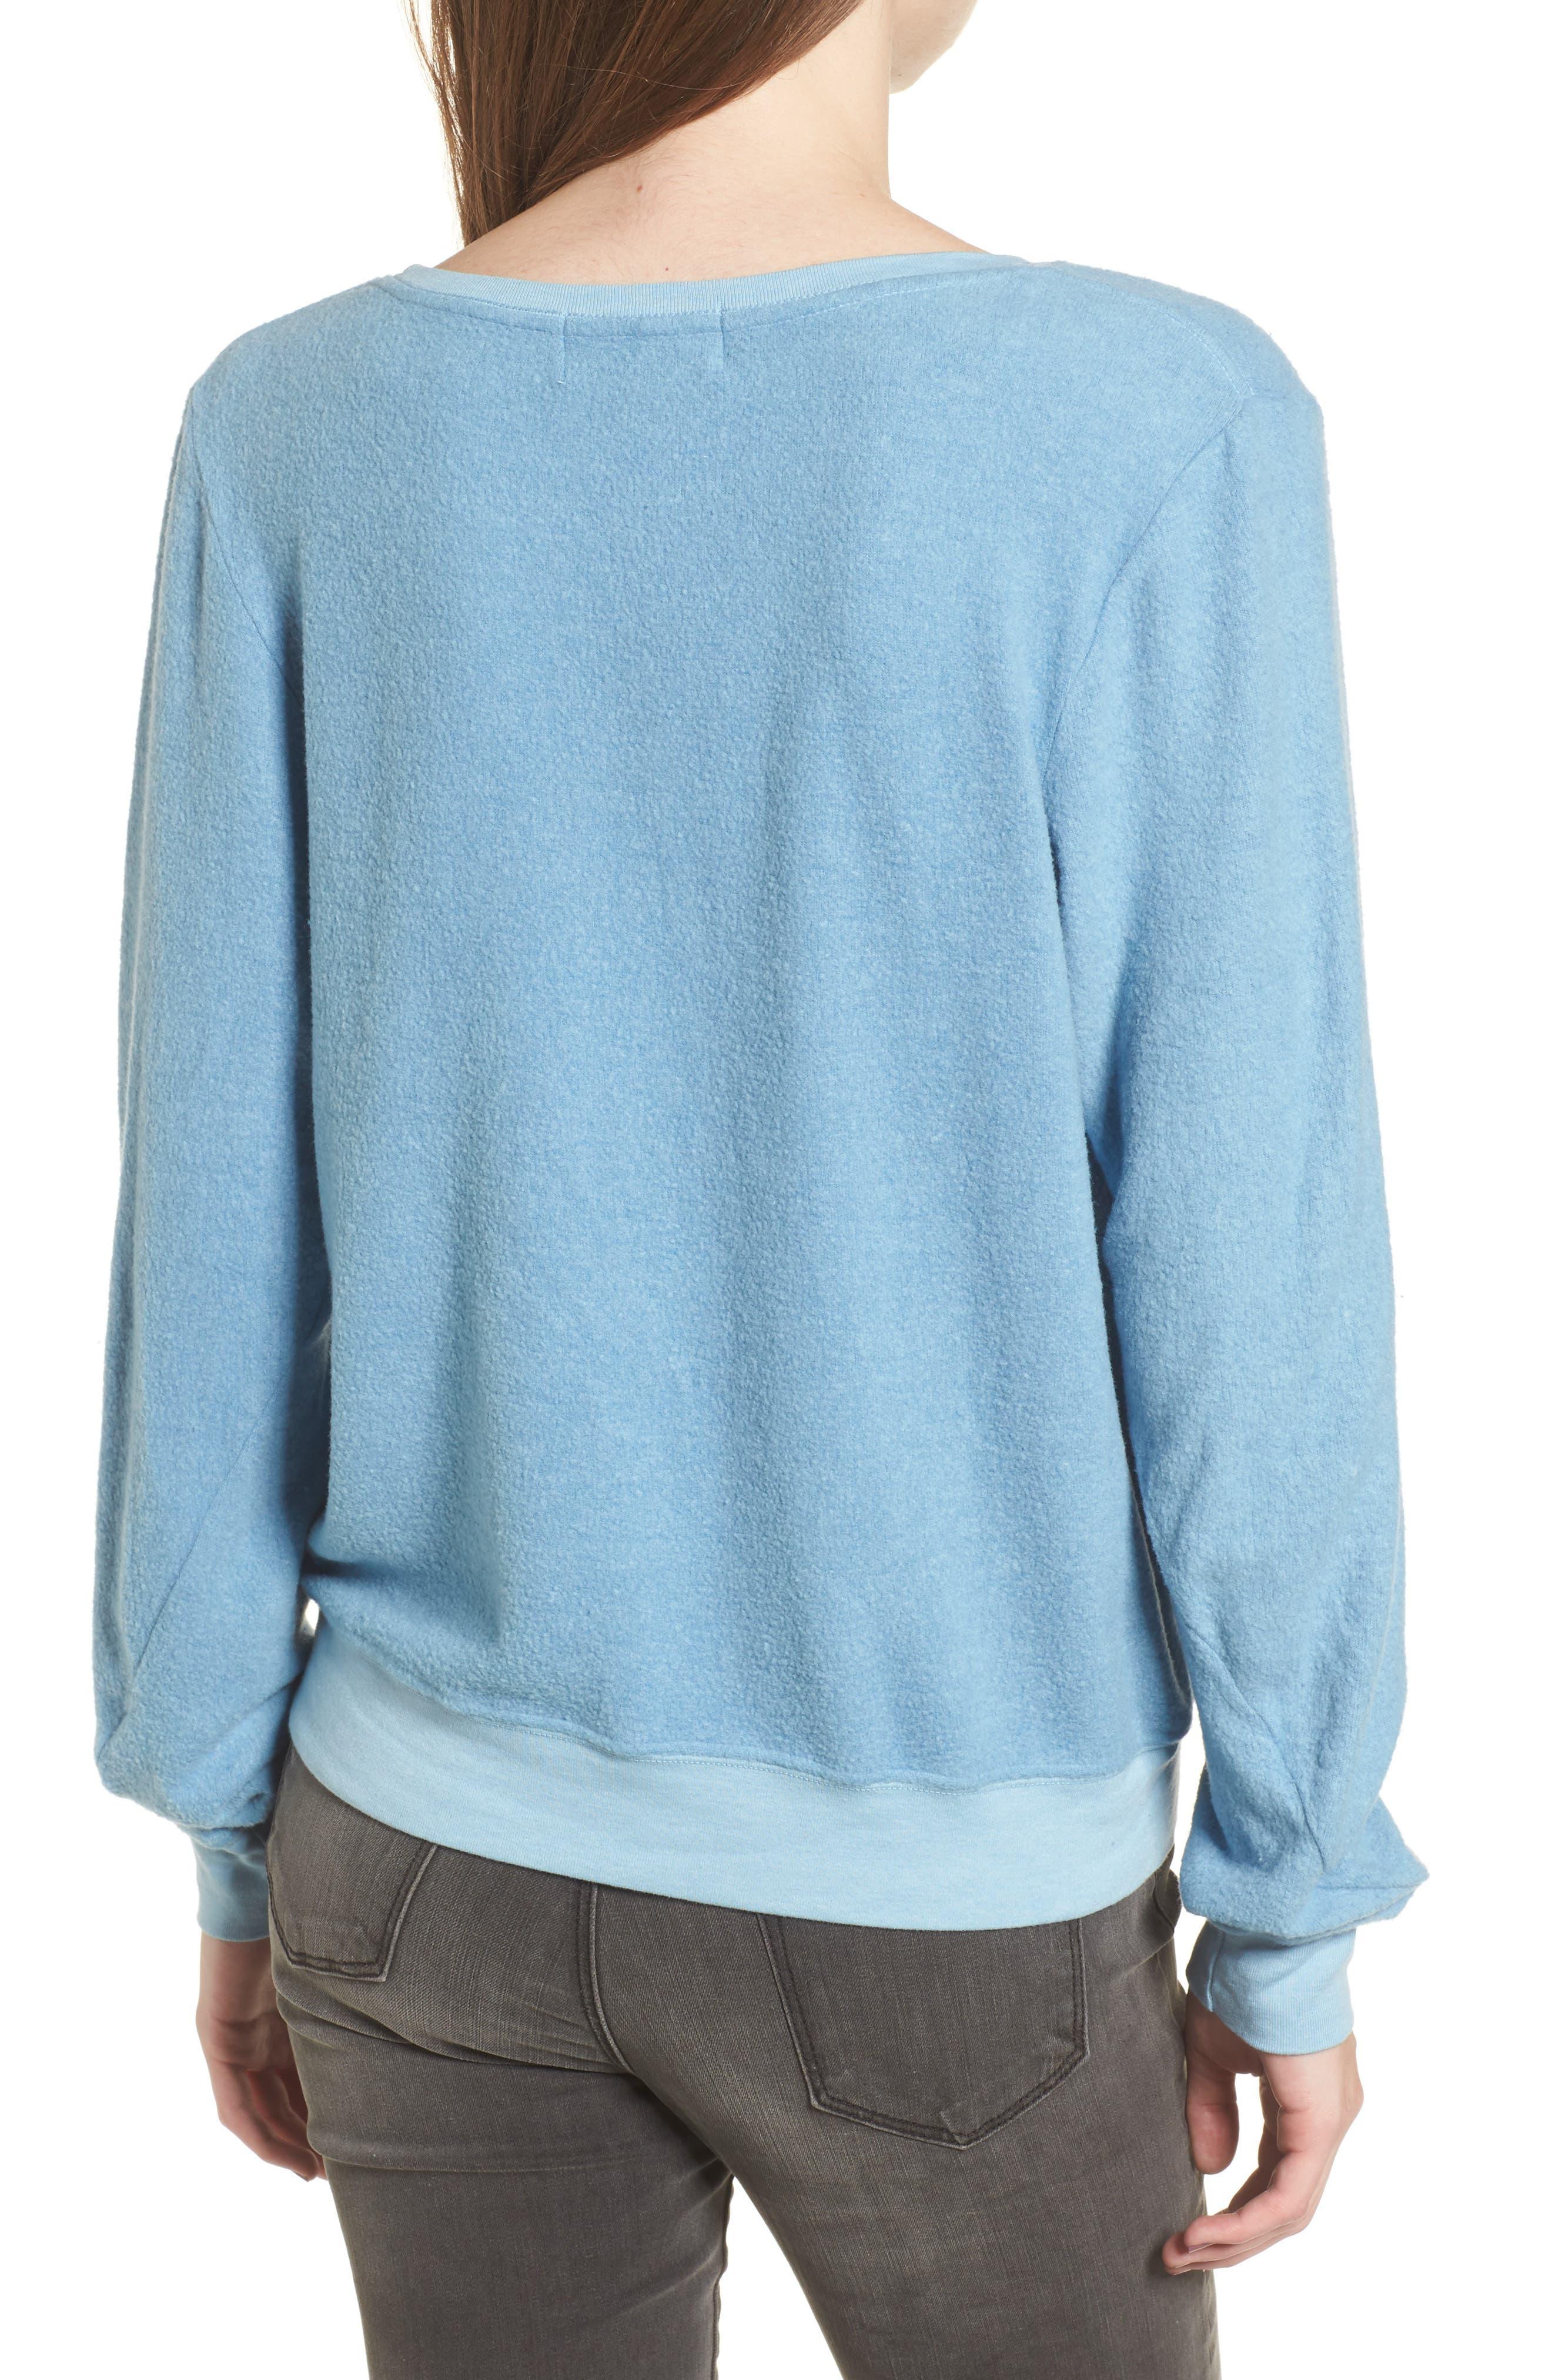 Très Chic Sweatshirt,                             Alternate thumbnail 2, color,                             Dahlia